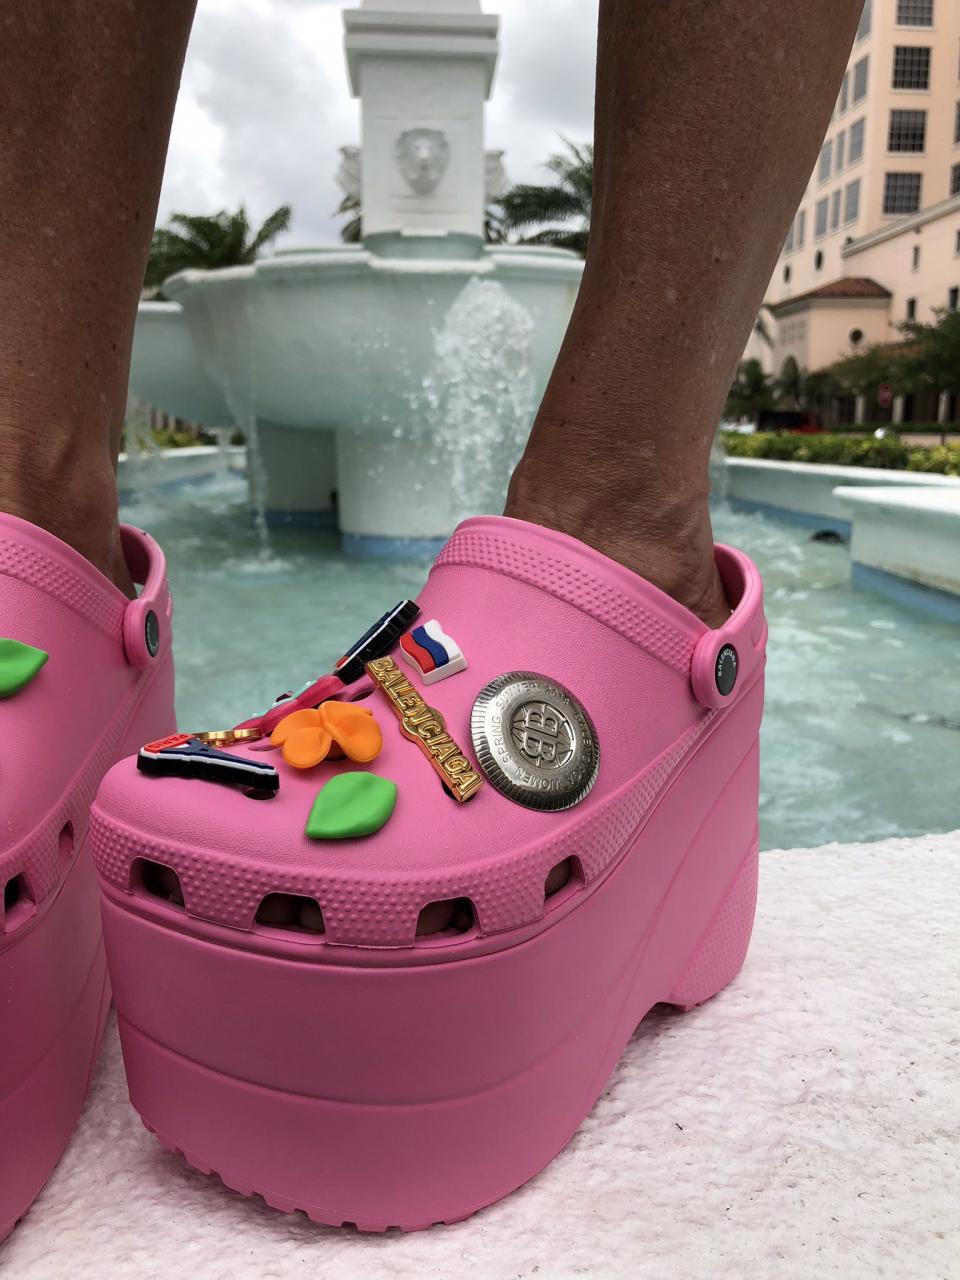 "Kara Alloway on Twitter: ""I hear chefs and surgeons wear @Crocs so ..."